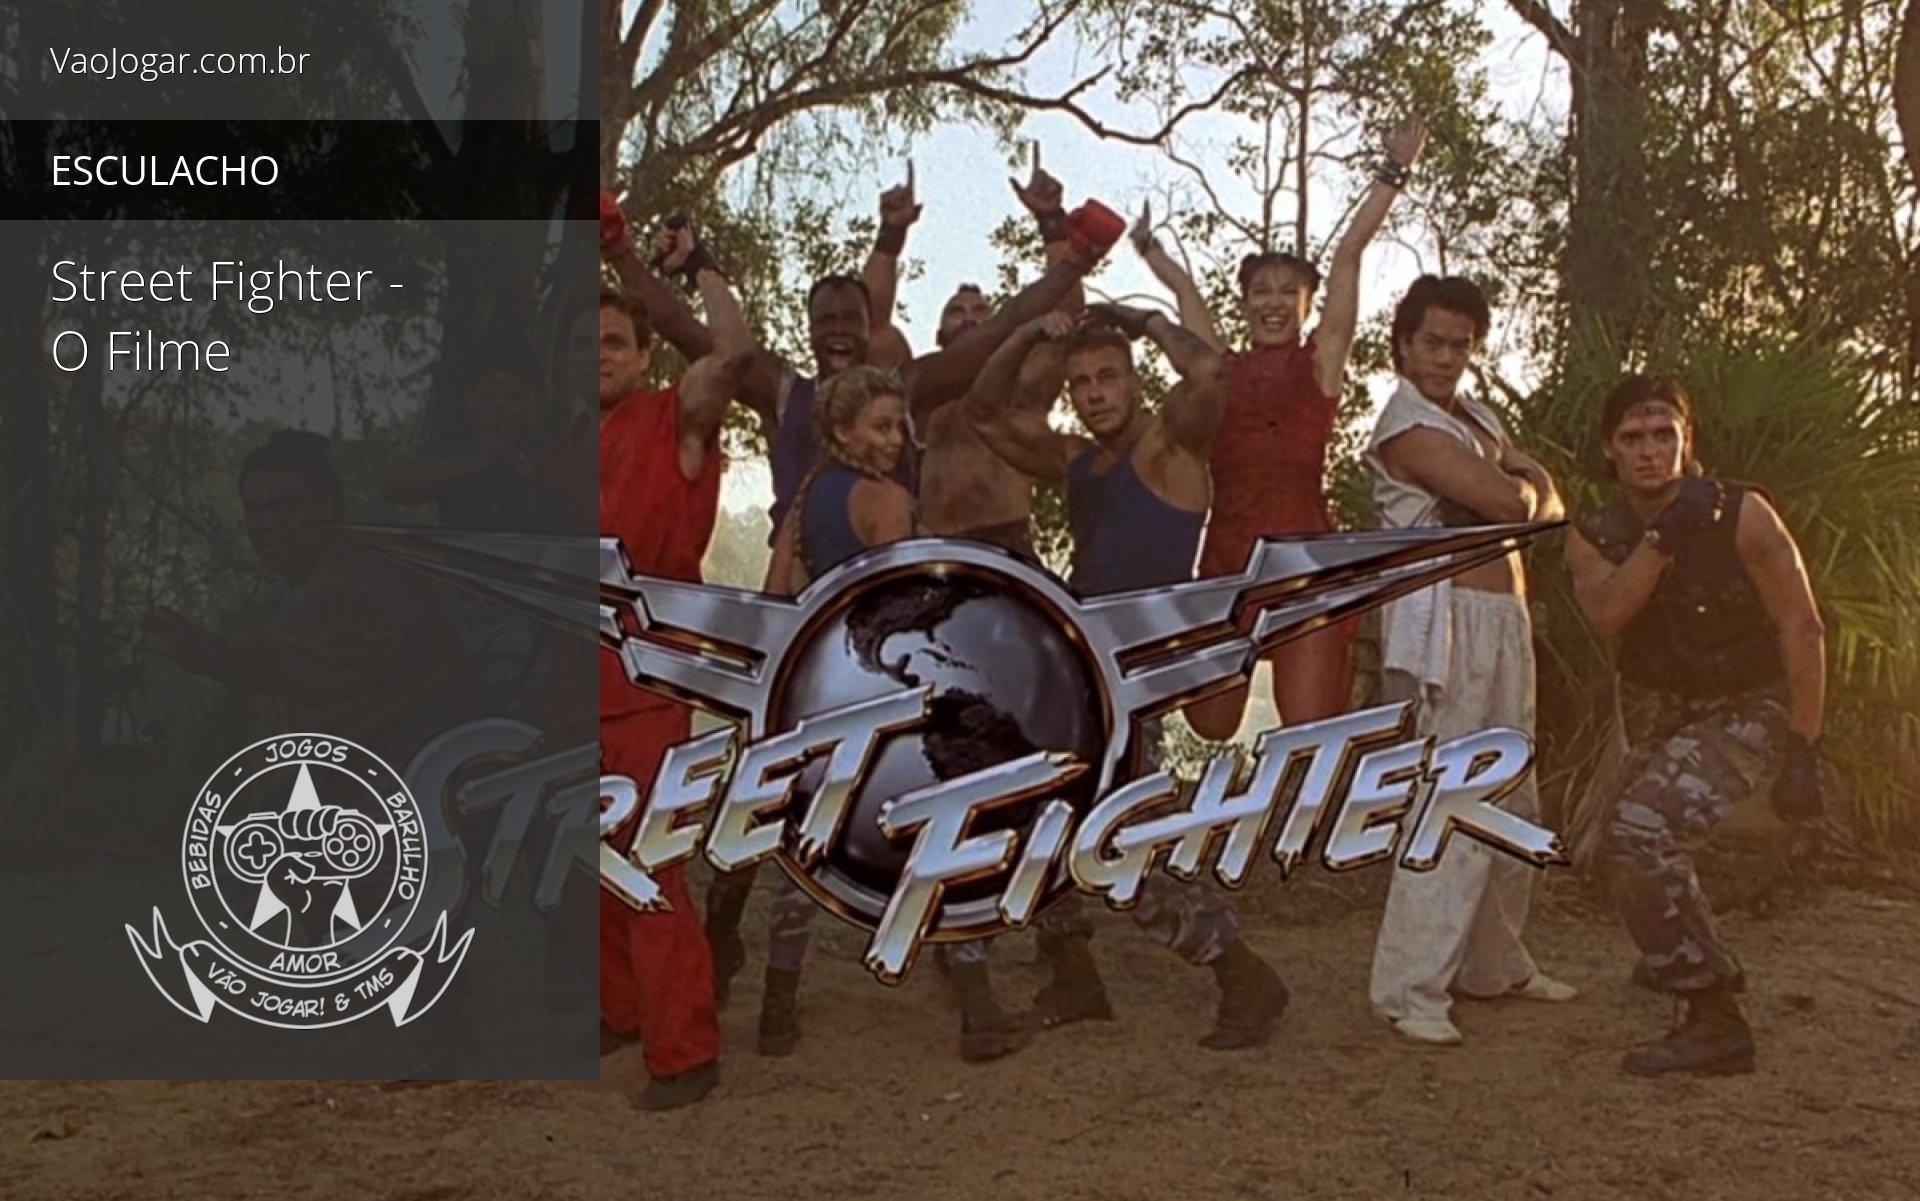 Street Fighter - O Filme